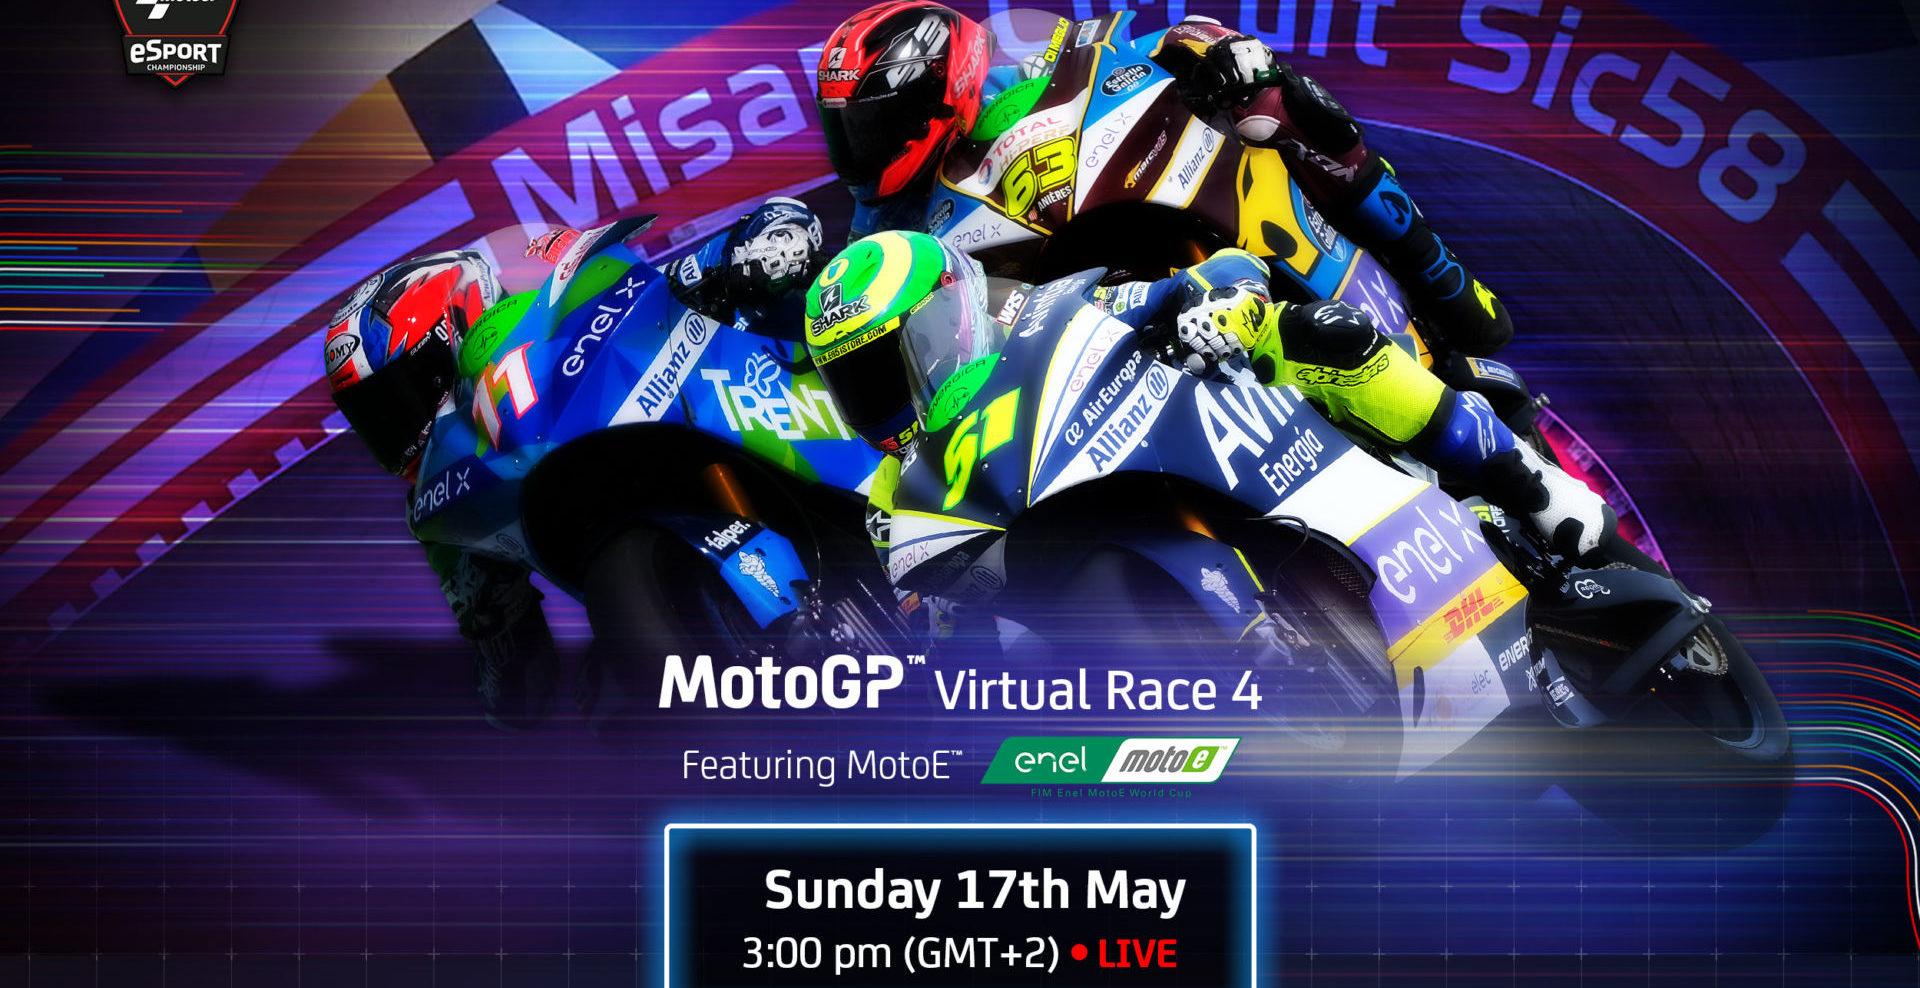 The MotoE class will be part of MotoGP Virtual Race 4 on May 17. Image courtesy Dorna.